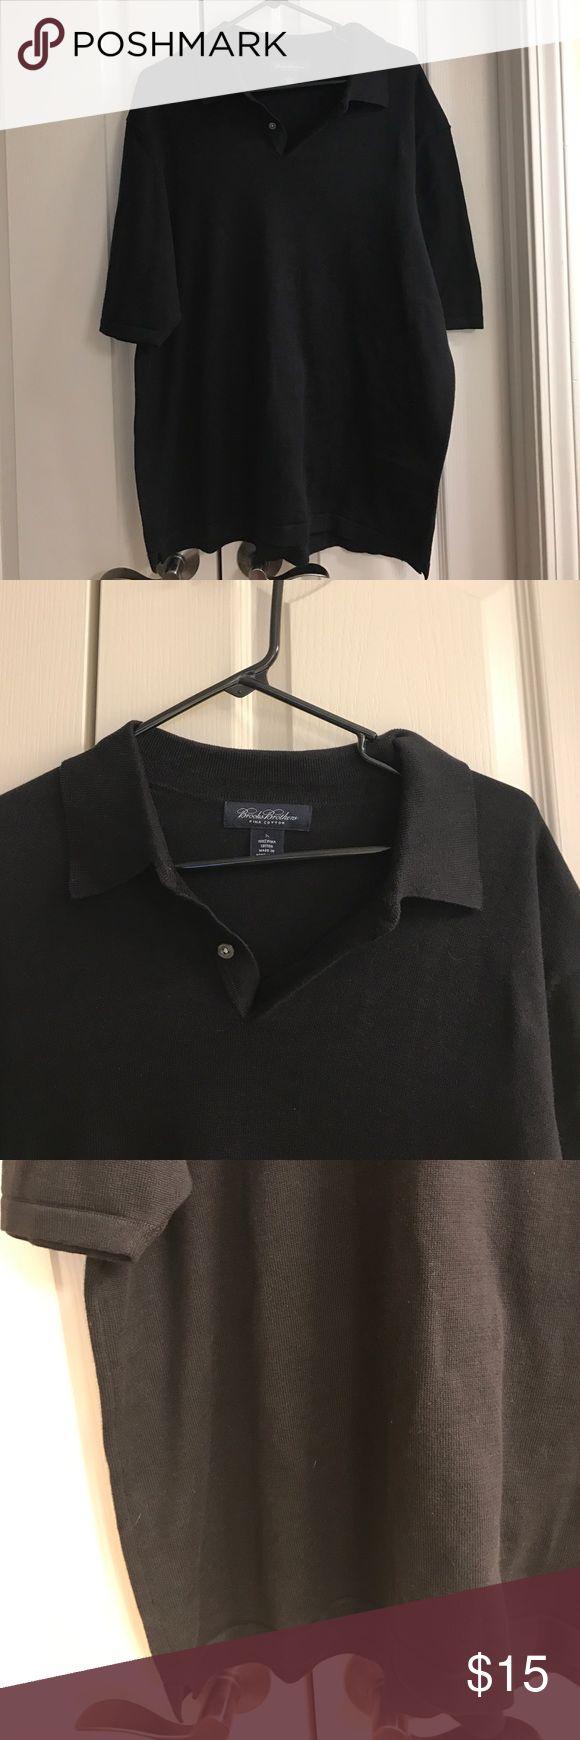 Size Large Brooks Brothers black polo shirt Size Large Brooks Brothers black polo shirt Brooks Brothers Shirts Polos